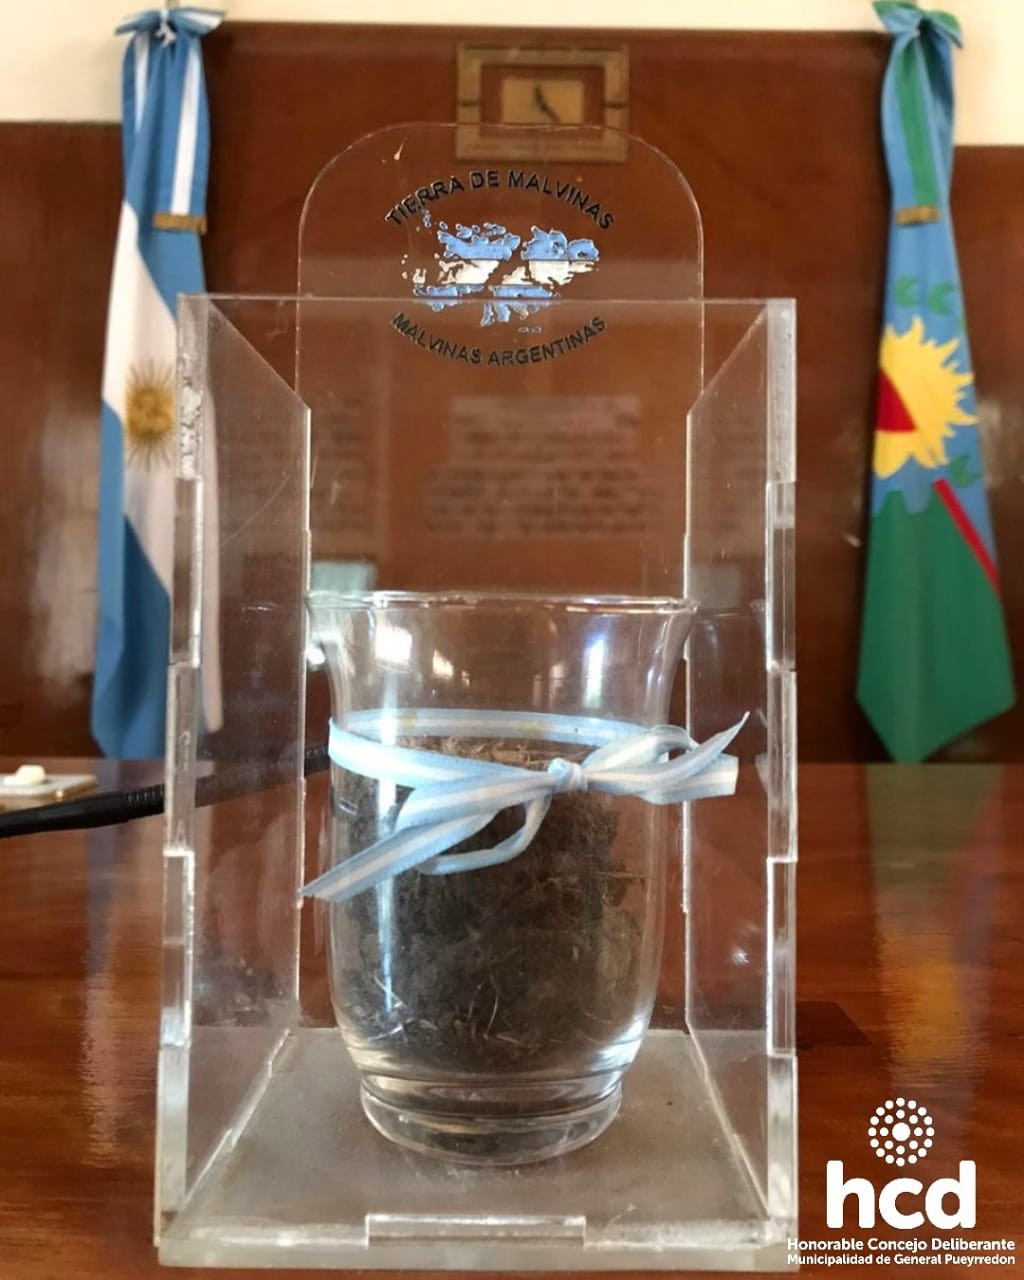 Malvinas: el Honorable Concejo Deliberante evoca una fecha significativa